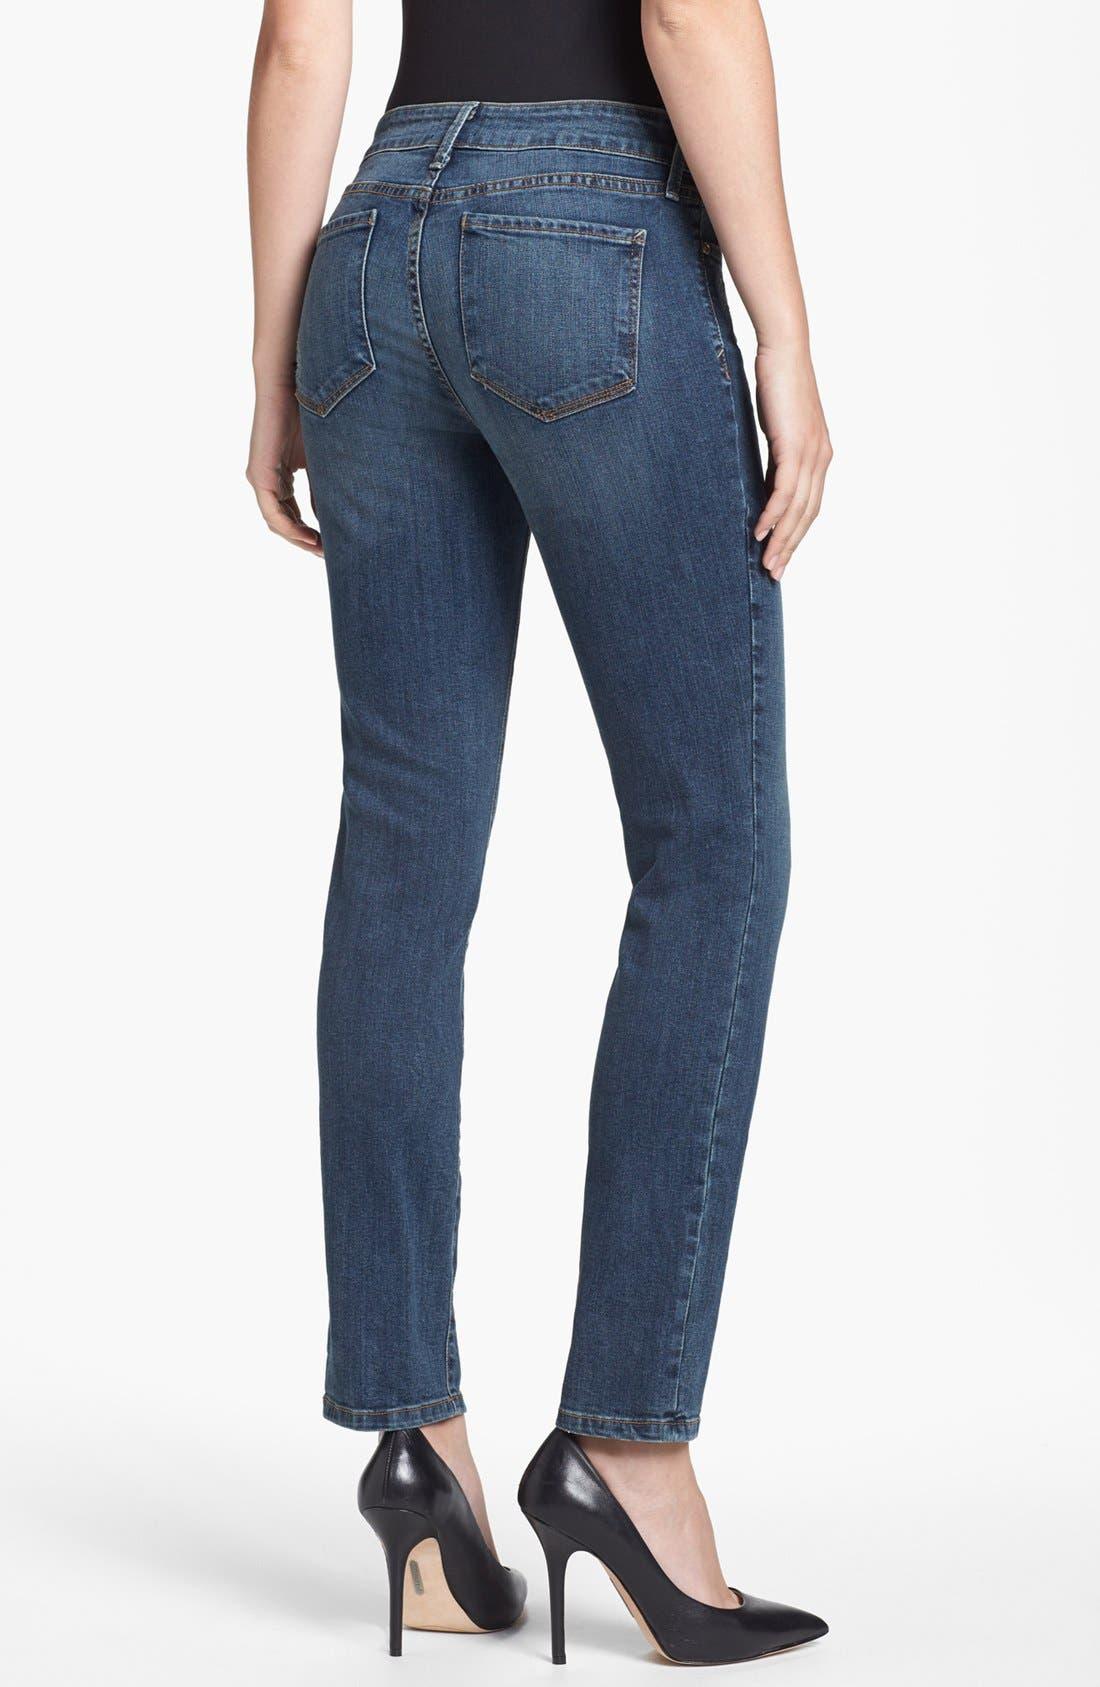 Alternate Image 3  - NYDJ 'Leann' Stretch Skinny Boyfriend Jeans (Loma Linda)